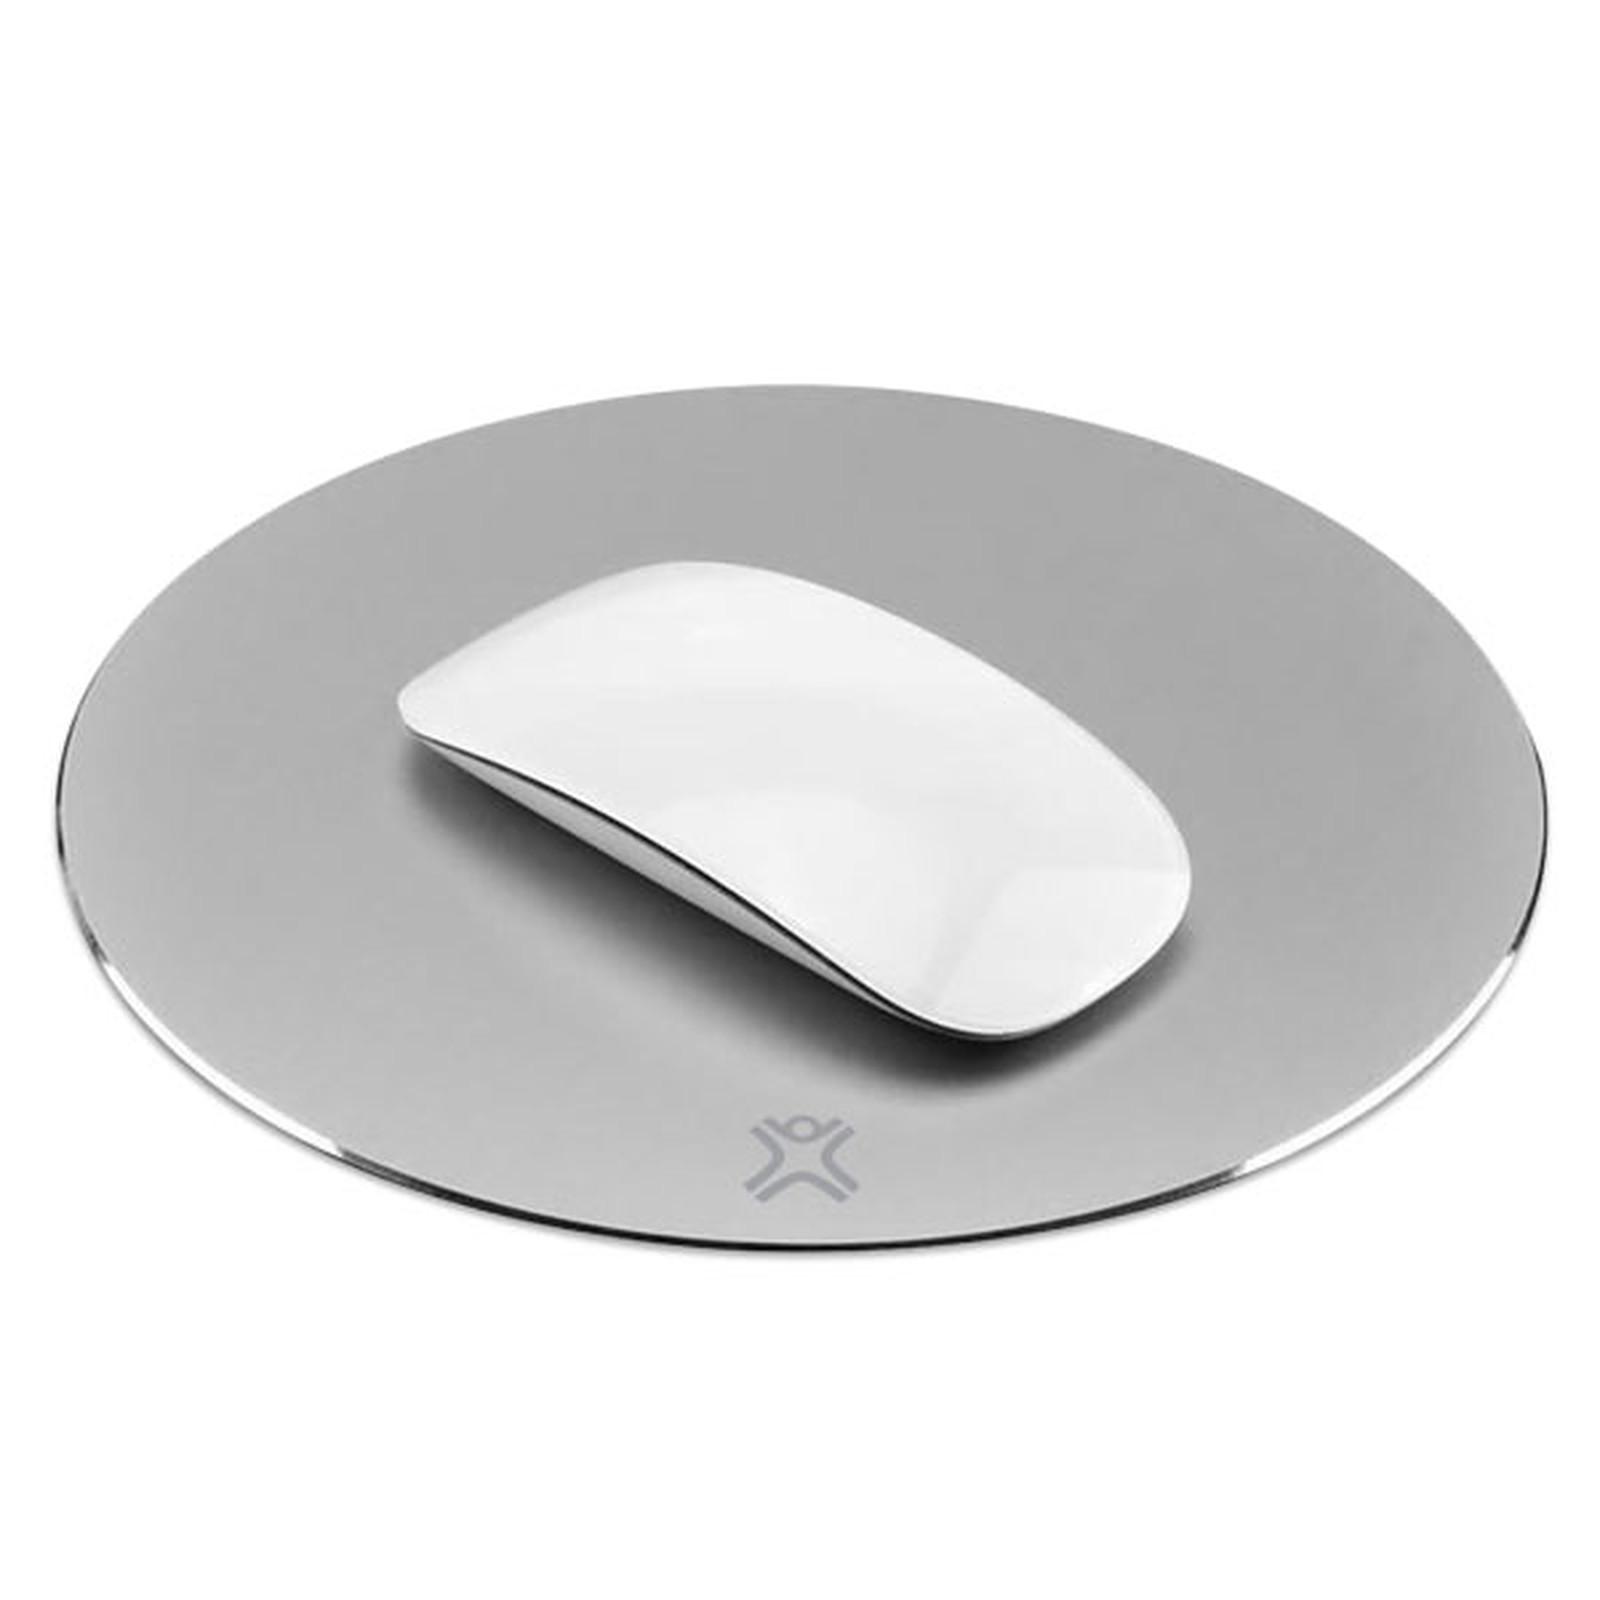 XtremeMac Aluminium Mouse Pad (Argent)